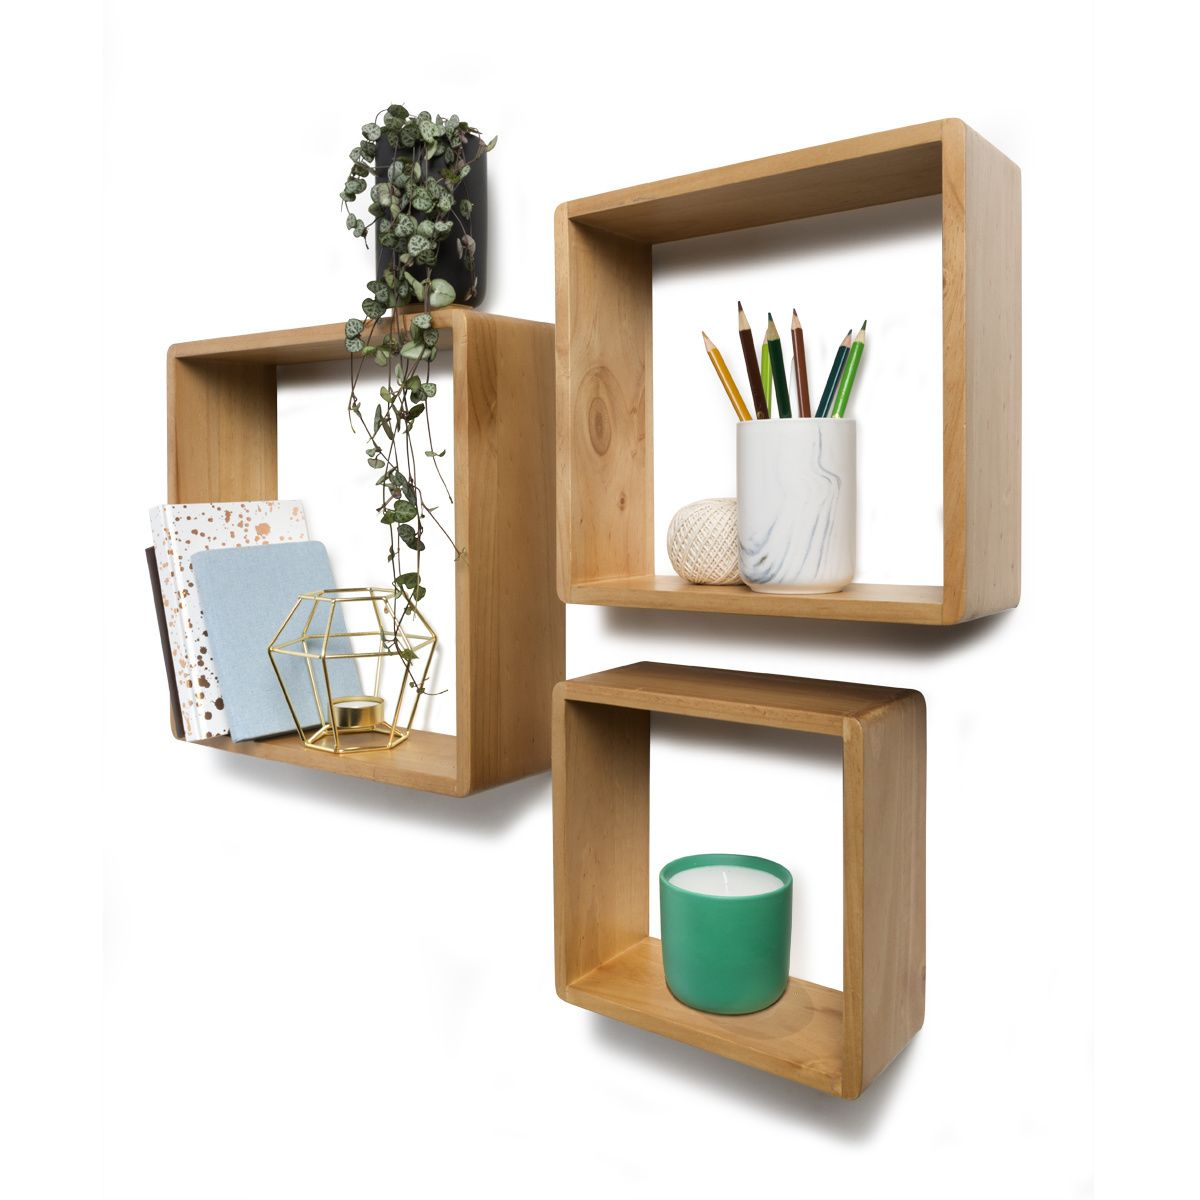 3 Square Wall Shelves | Kmart | Wall shelves, Shelves, Decor